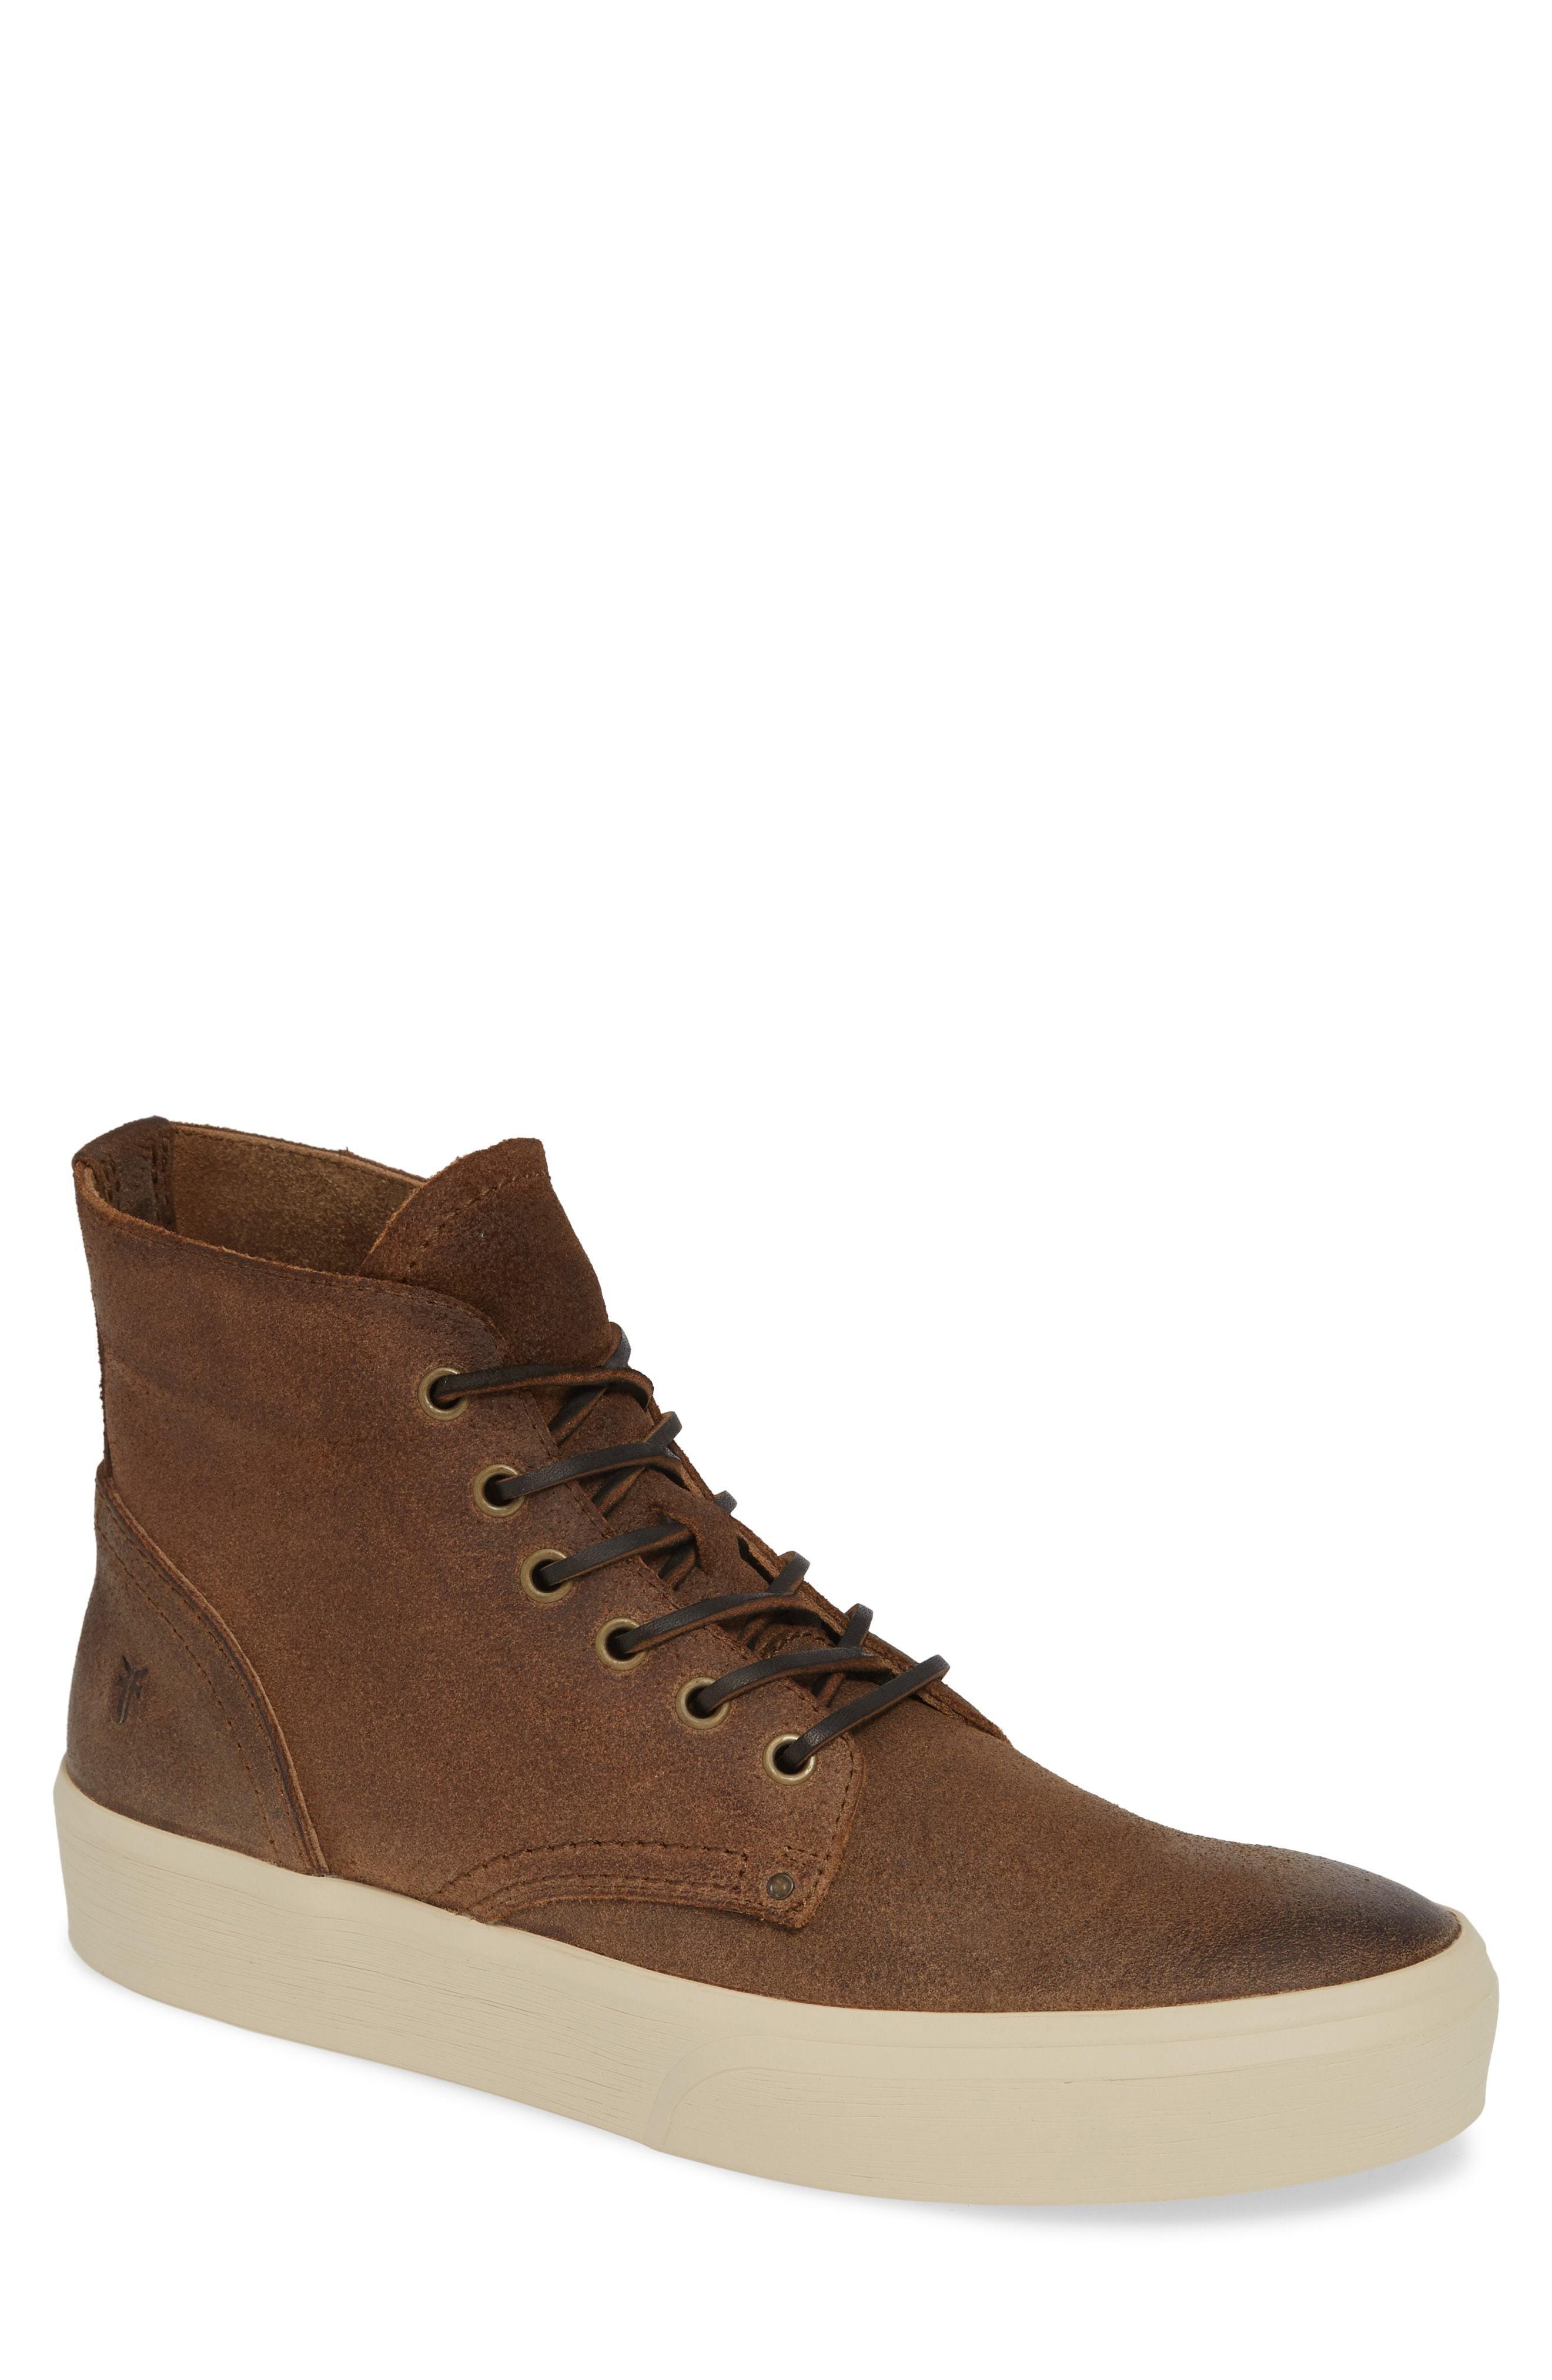 a9a5984aef3 Frye Beacon High Top Platform Sneaker, $258 | Nordstrom | Lookastic.com